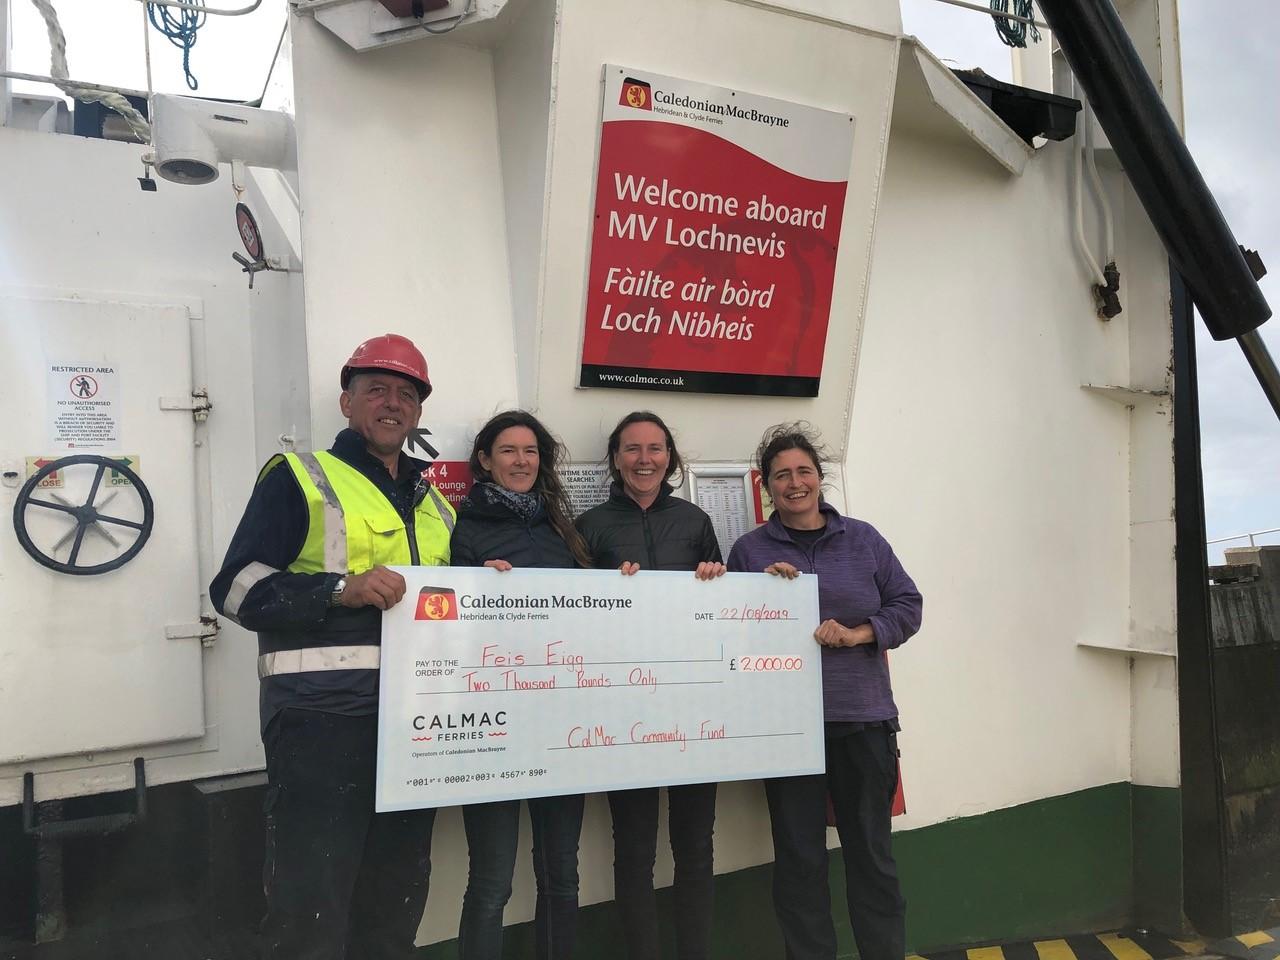 V Loch Nevis crewman Murdo Ferguson presents the Community Fund cheque to representatives of Fèis Eige.